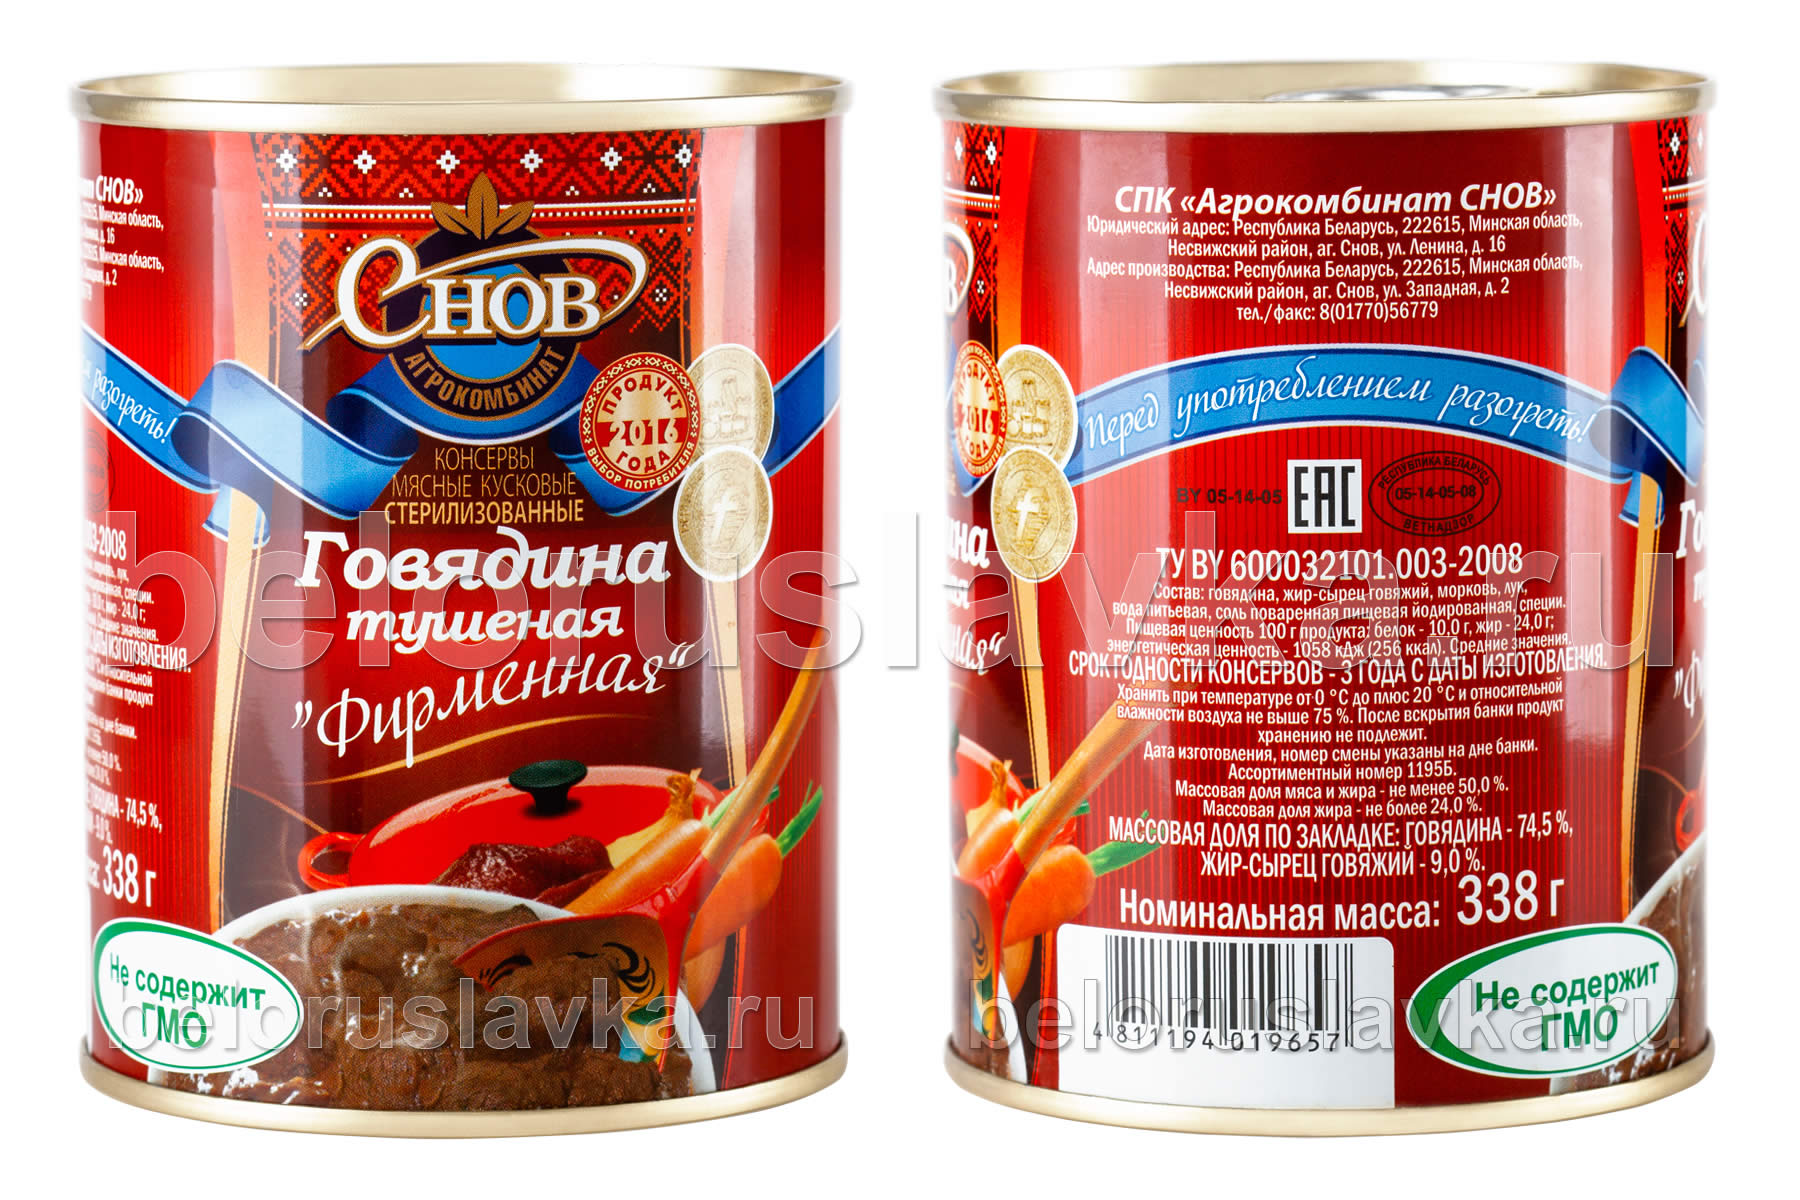 Beloruslavka-SNOV-Firmennaya-govyadina-T